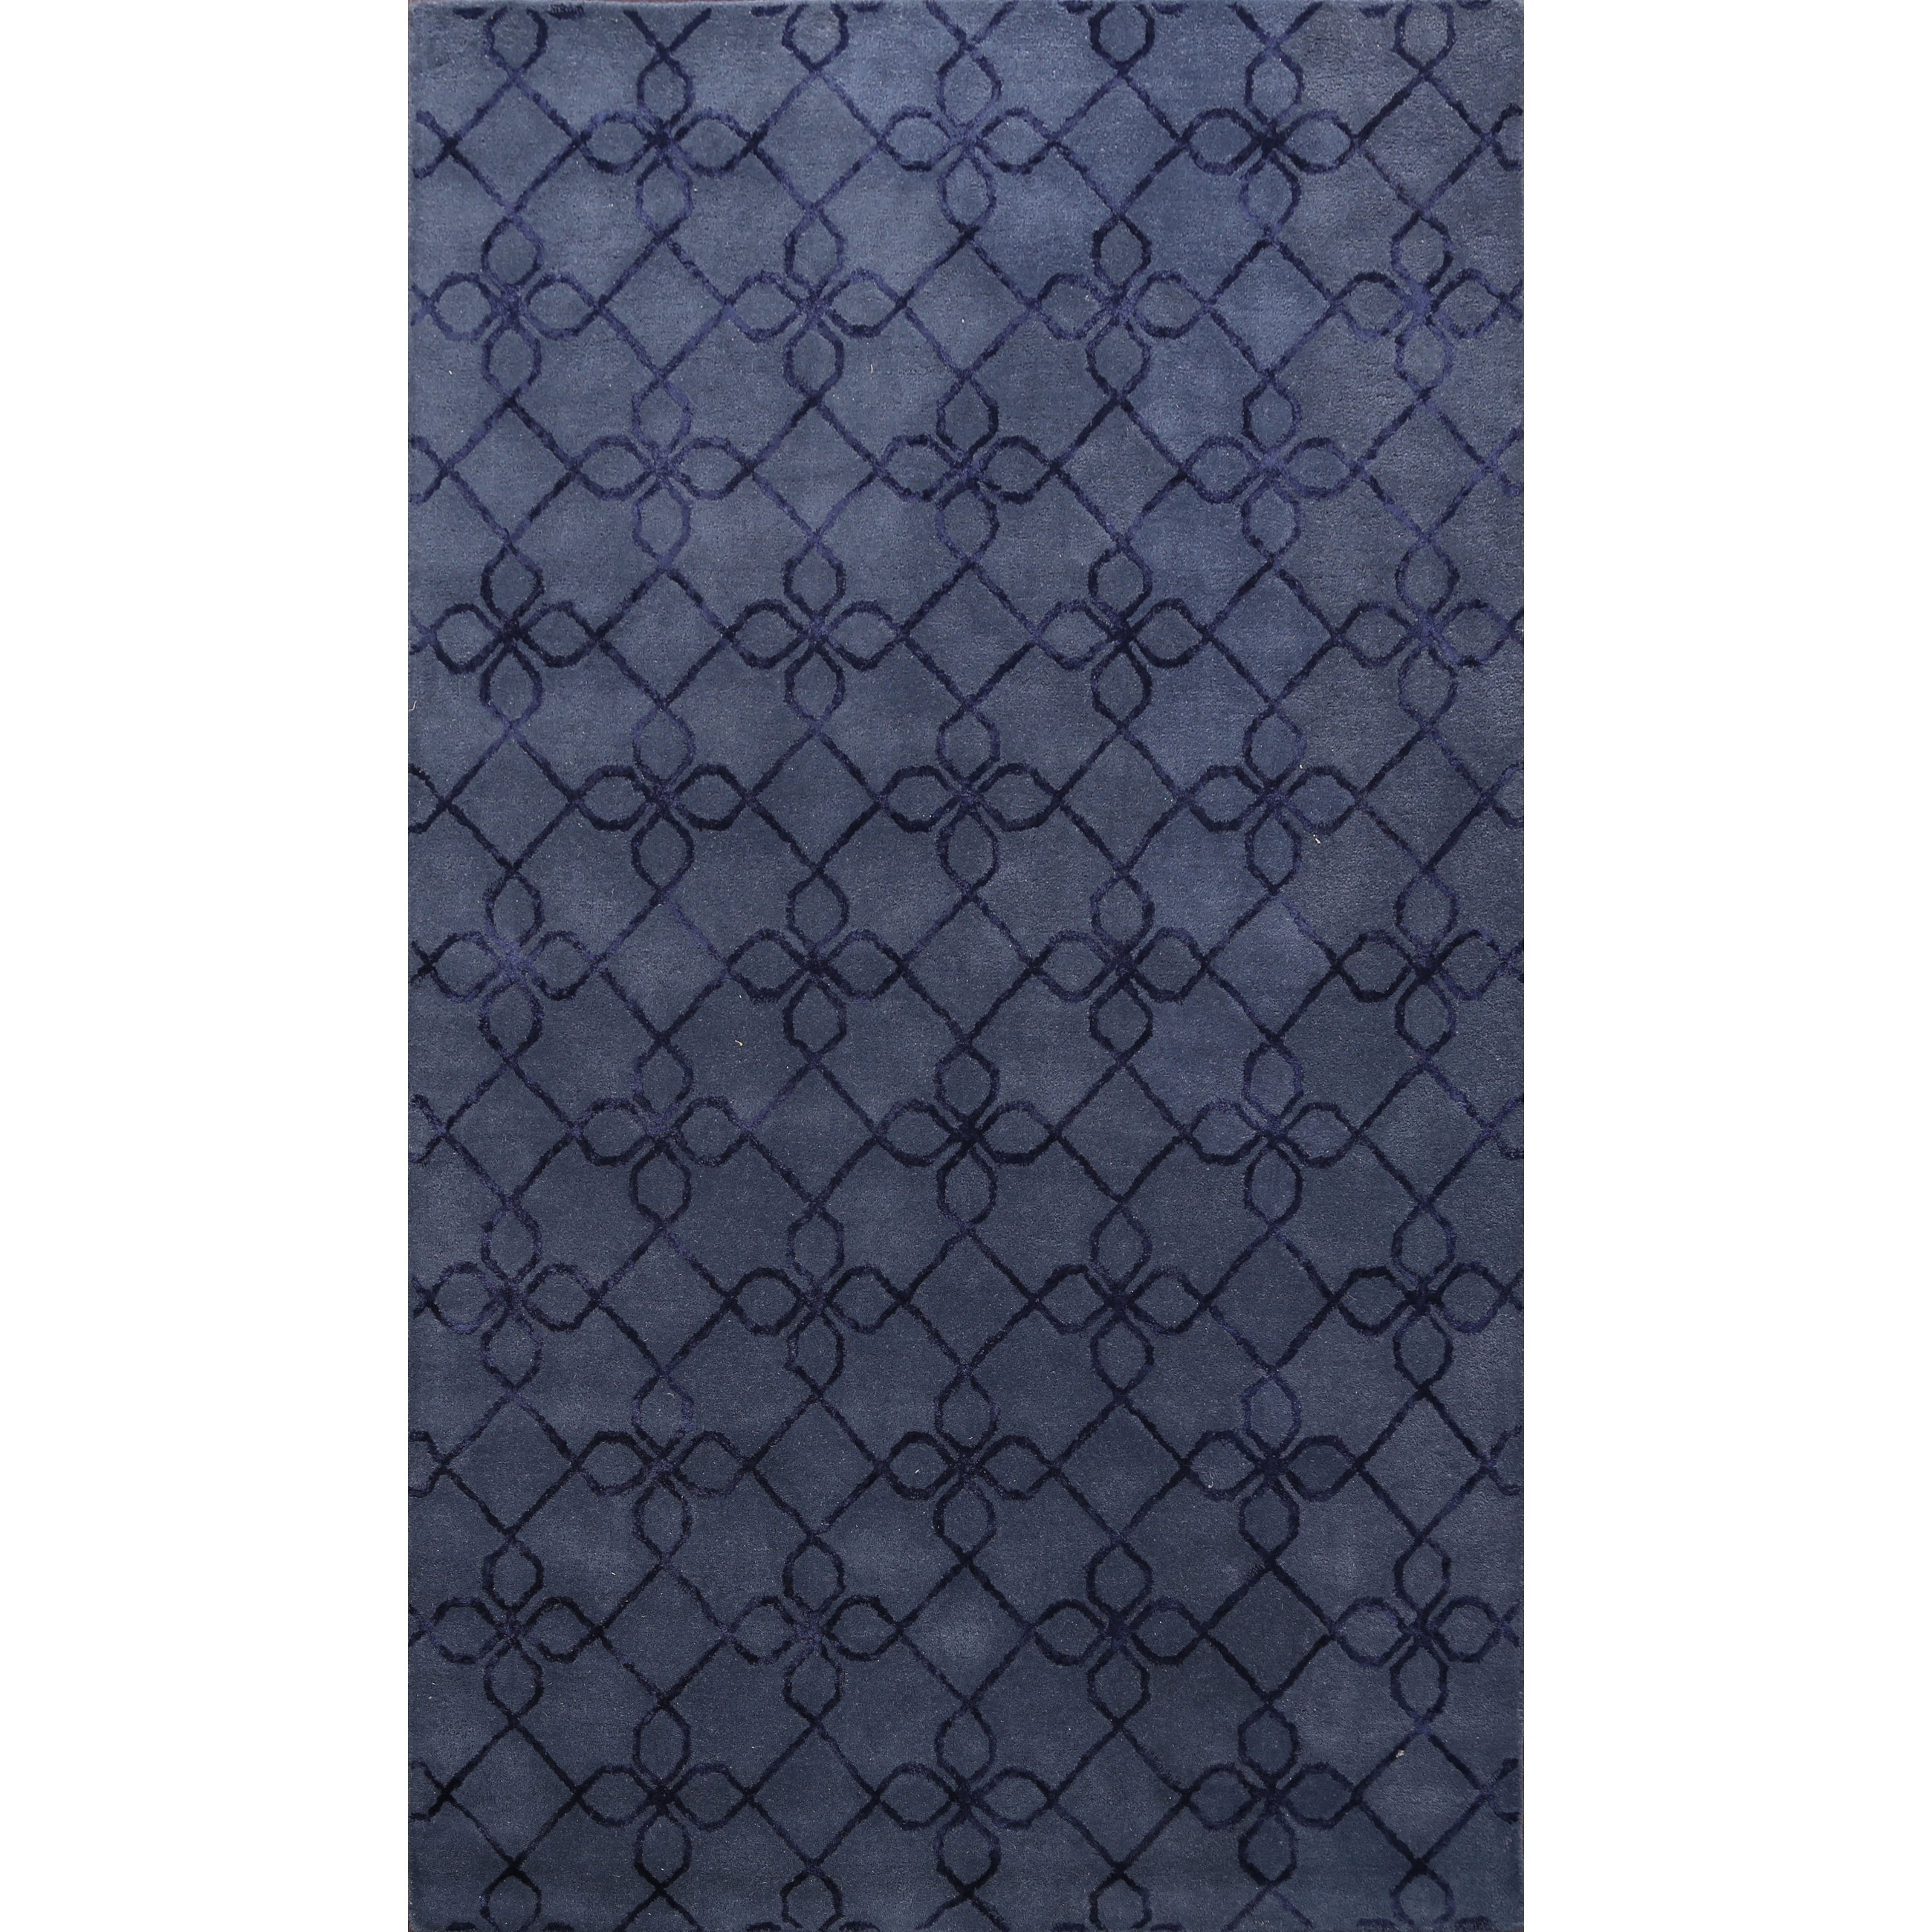 Navy Blue Wool Silk Modern Trellis Area Rug Oriental Hand Tufted 5 0 X 8 0 On Sale Overstock 31705035